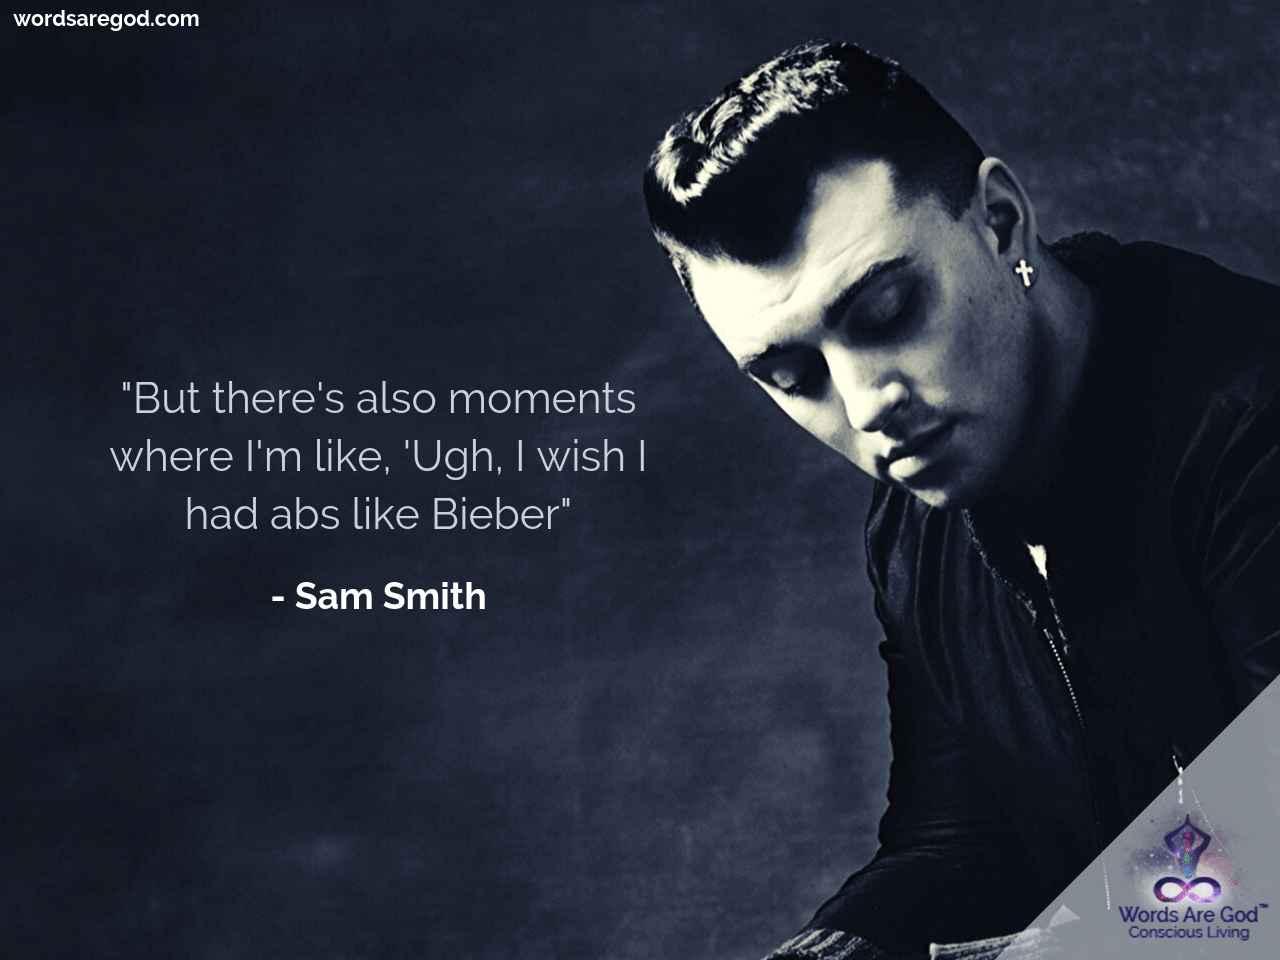 Sam Smith Inspirational Quote